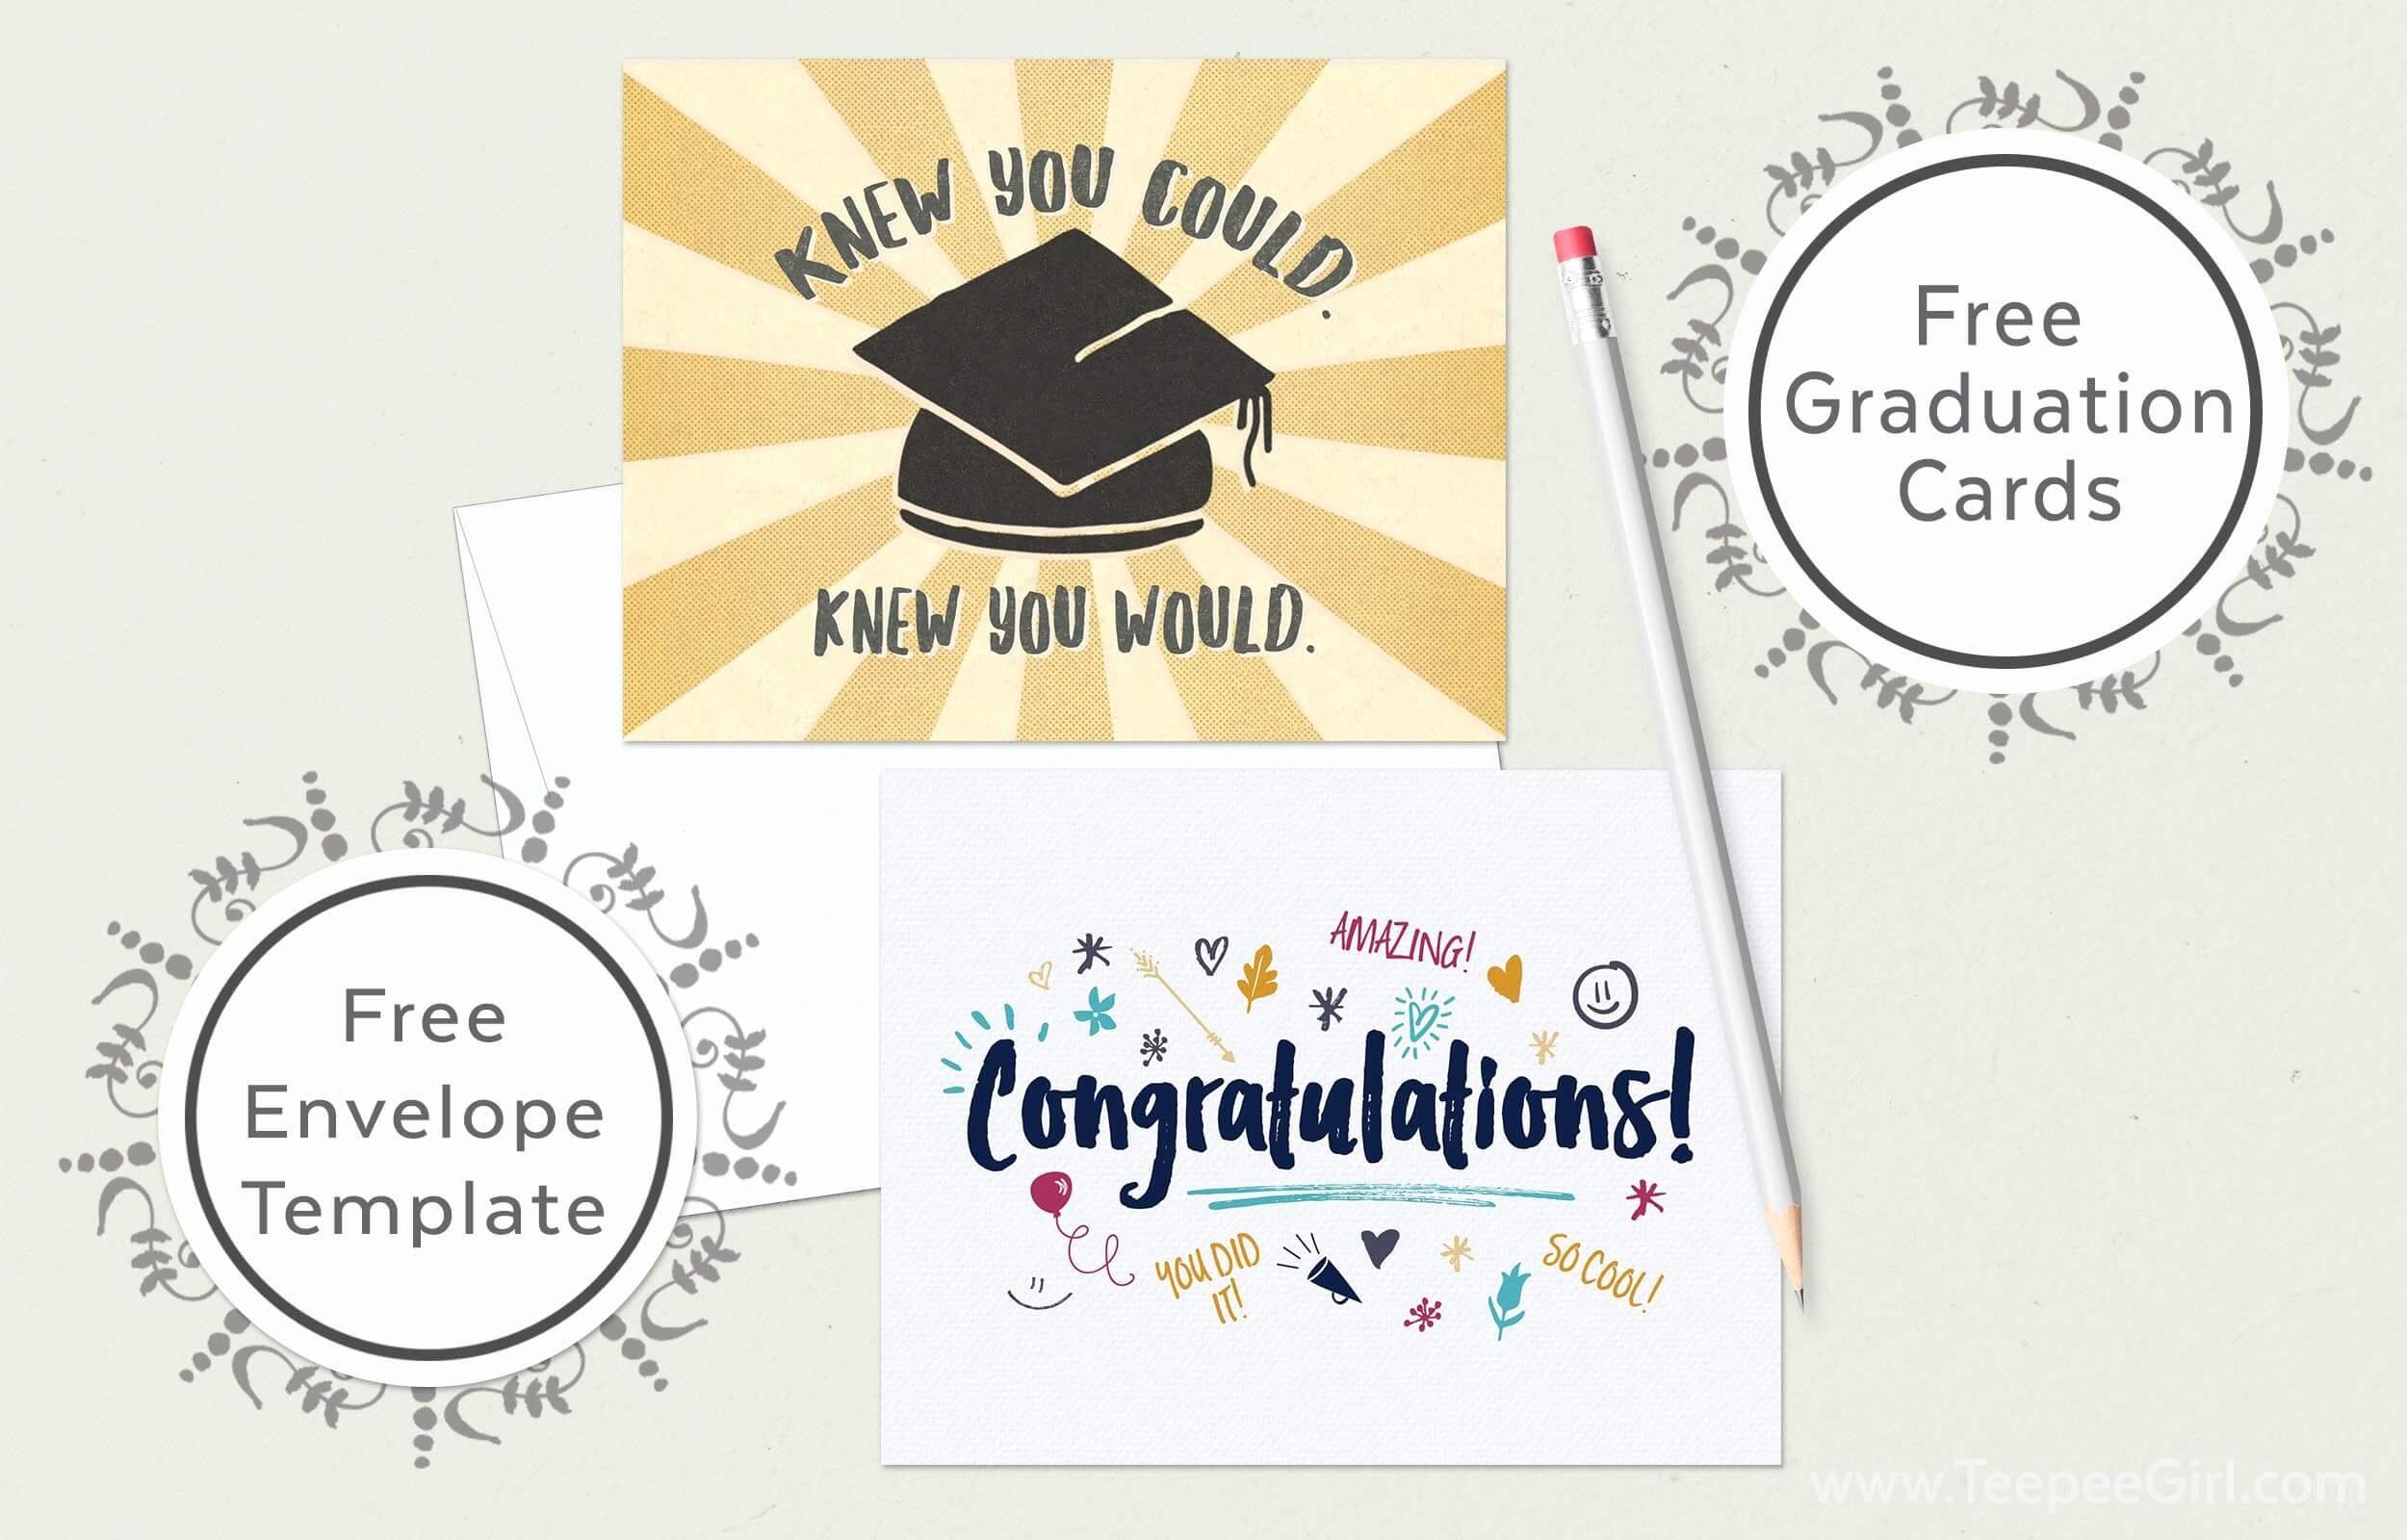 Free Graduation Cards (+ Envelope Template) Www.teepeegirl - Free Printable Graduation Cards To Print